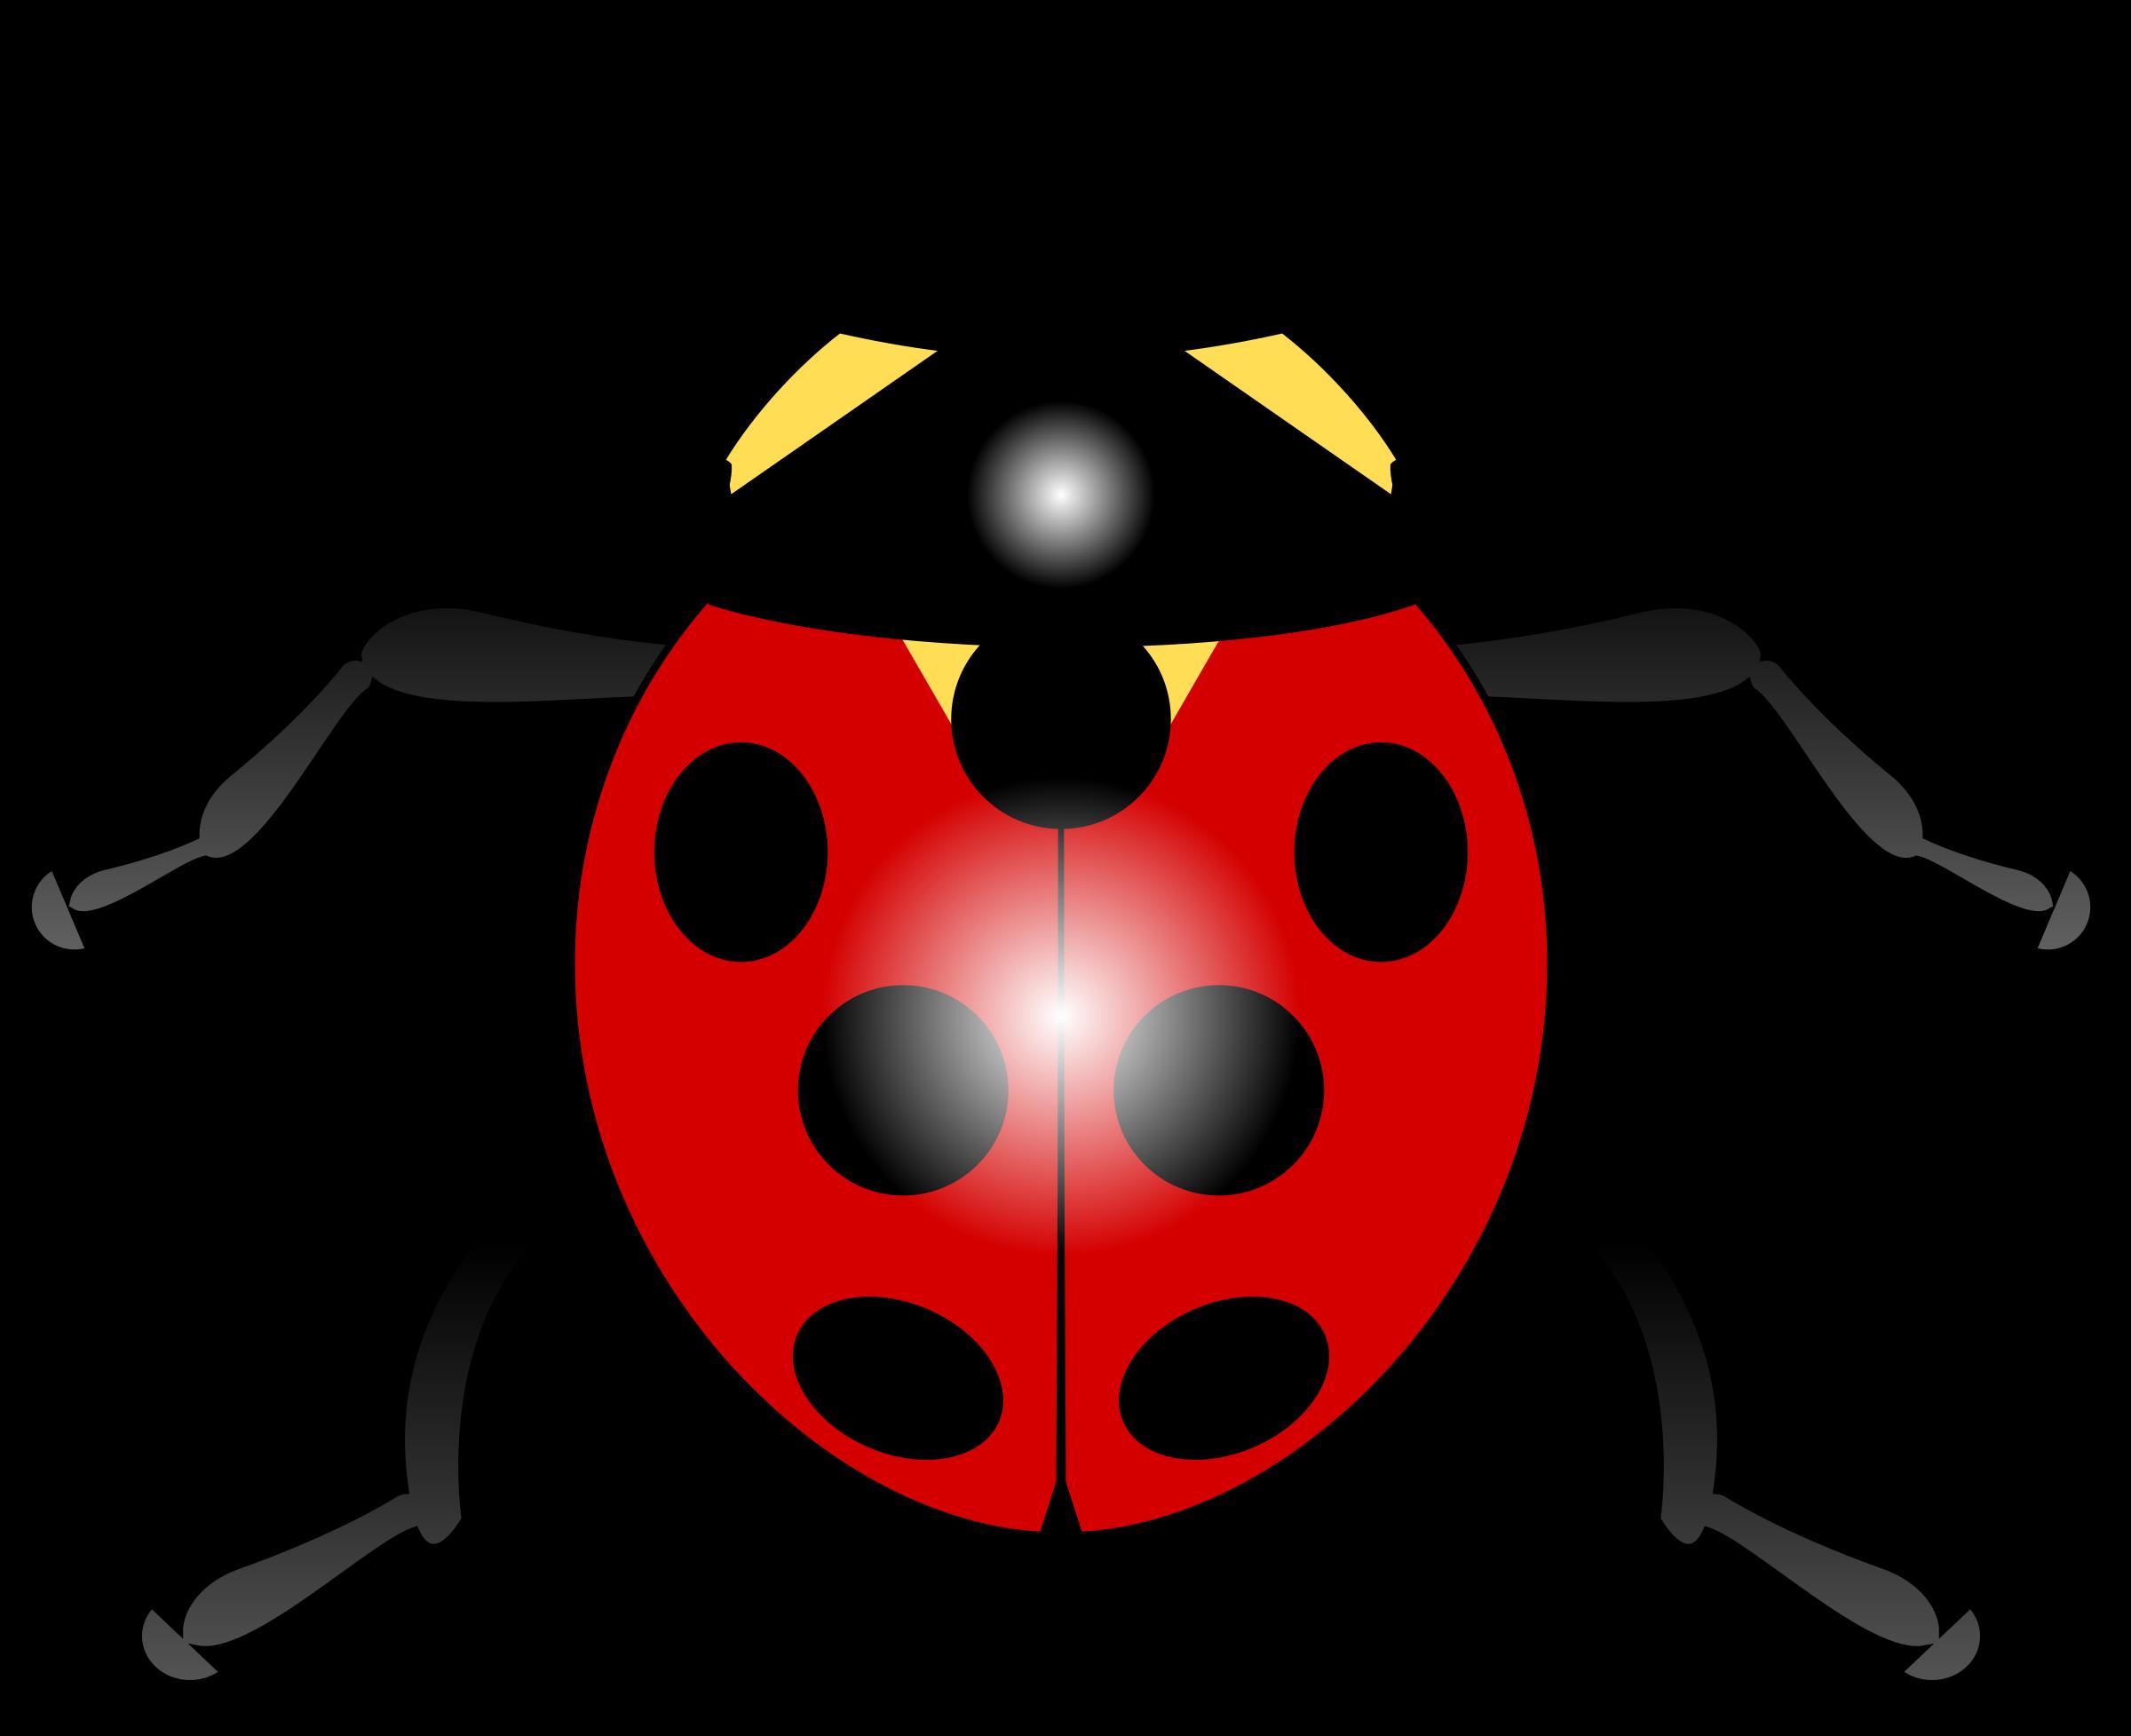 . Ladybug clipart red animal